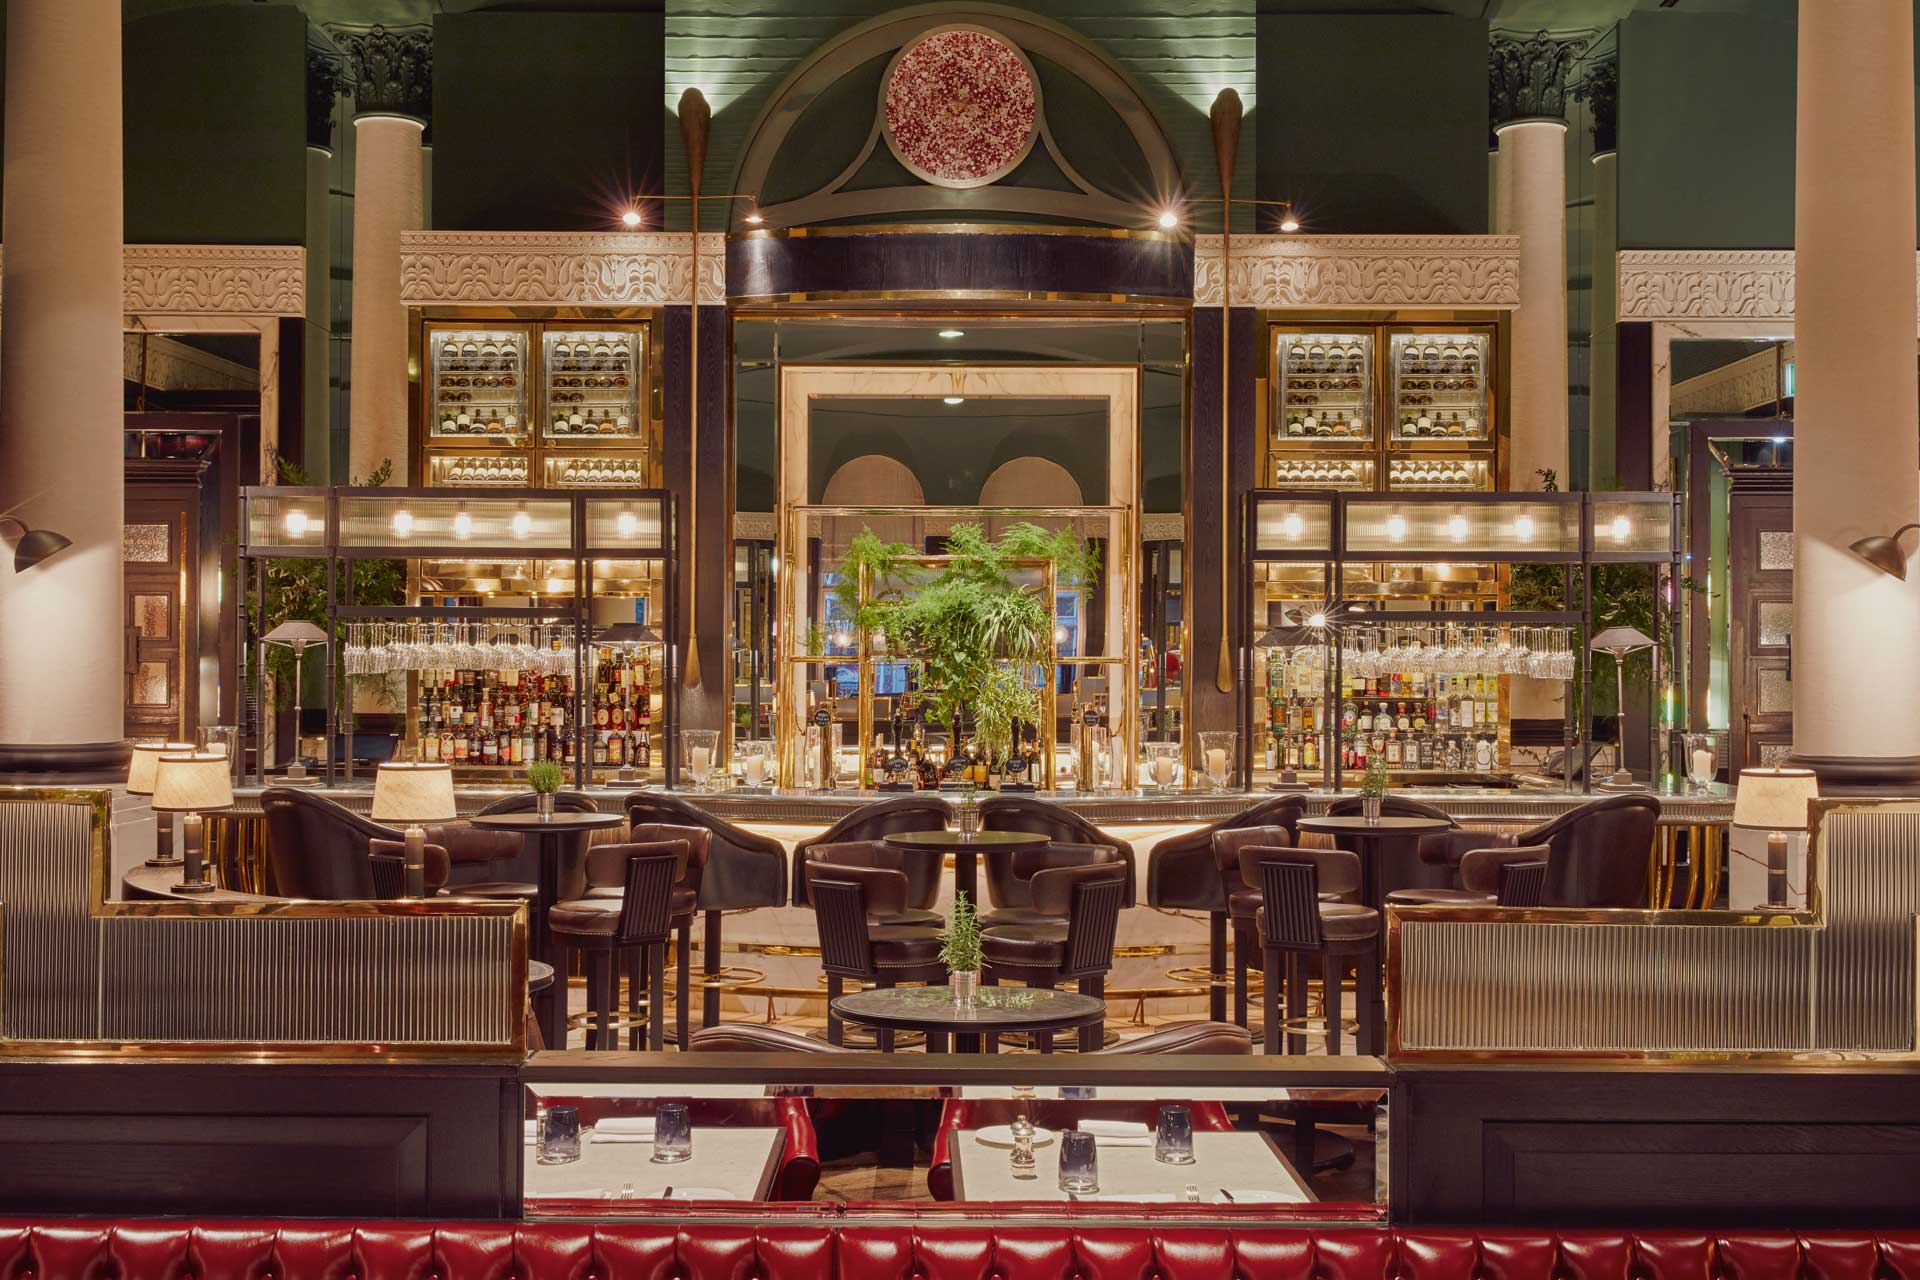 Bar area of Tom Kerridge's restaurant Kerridge's Bar & Grill